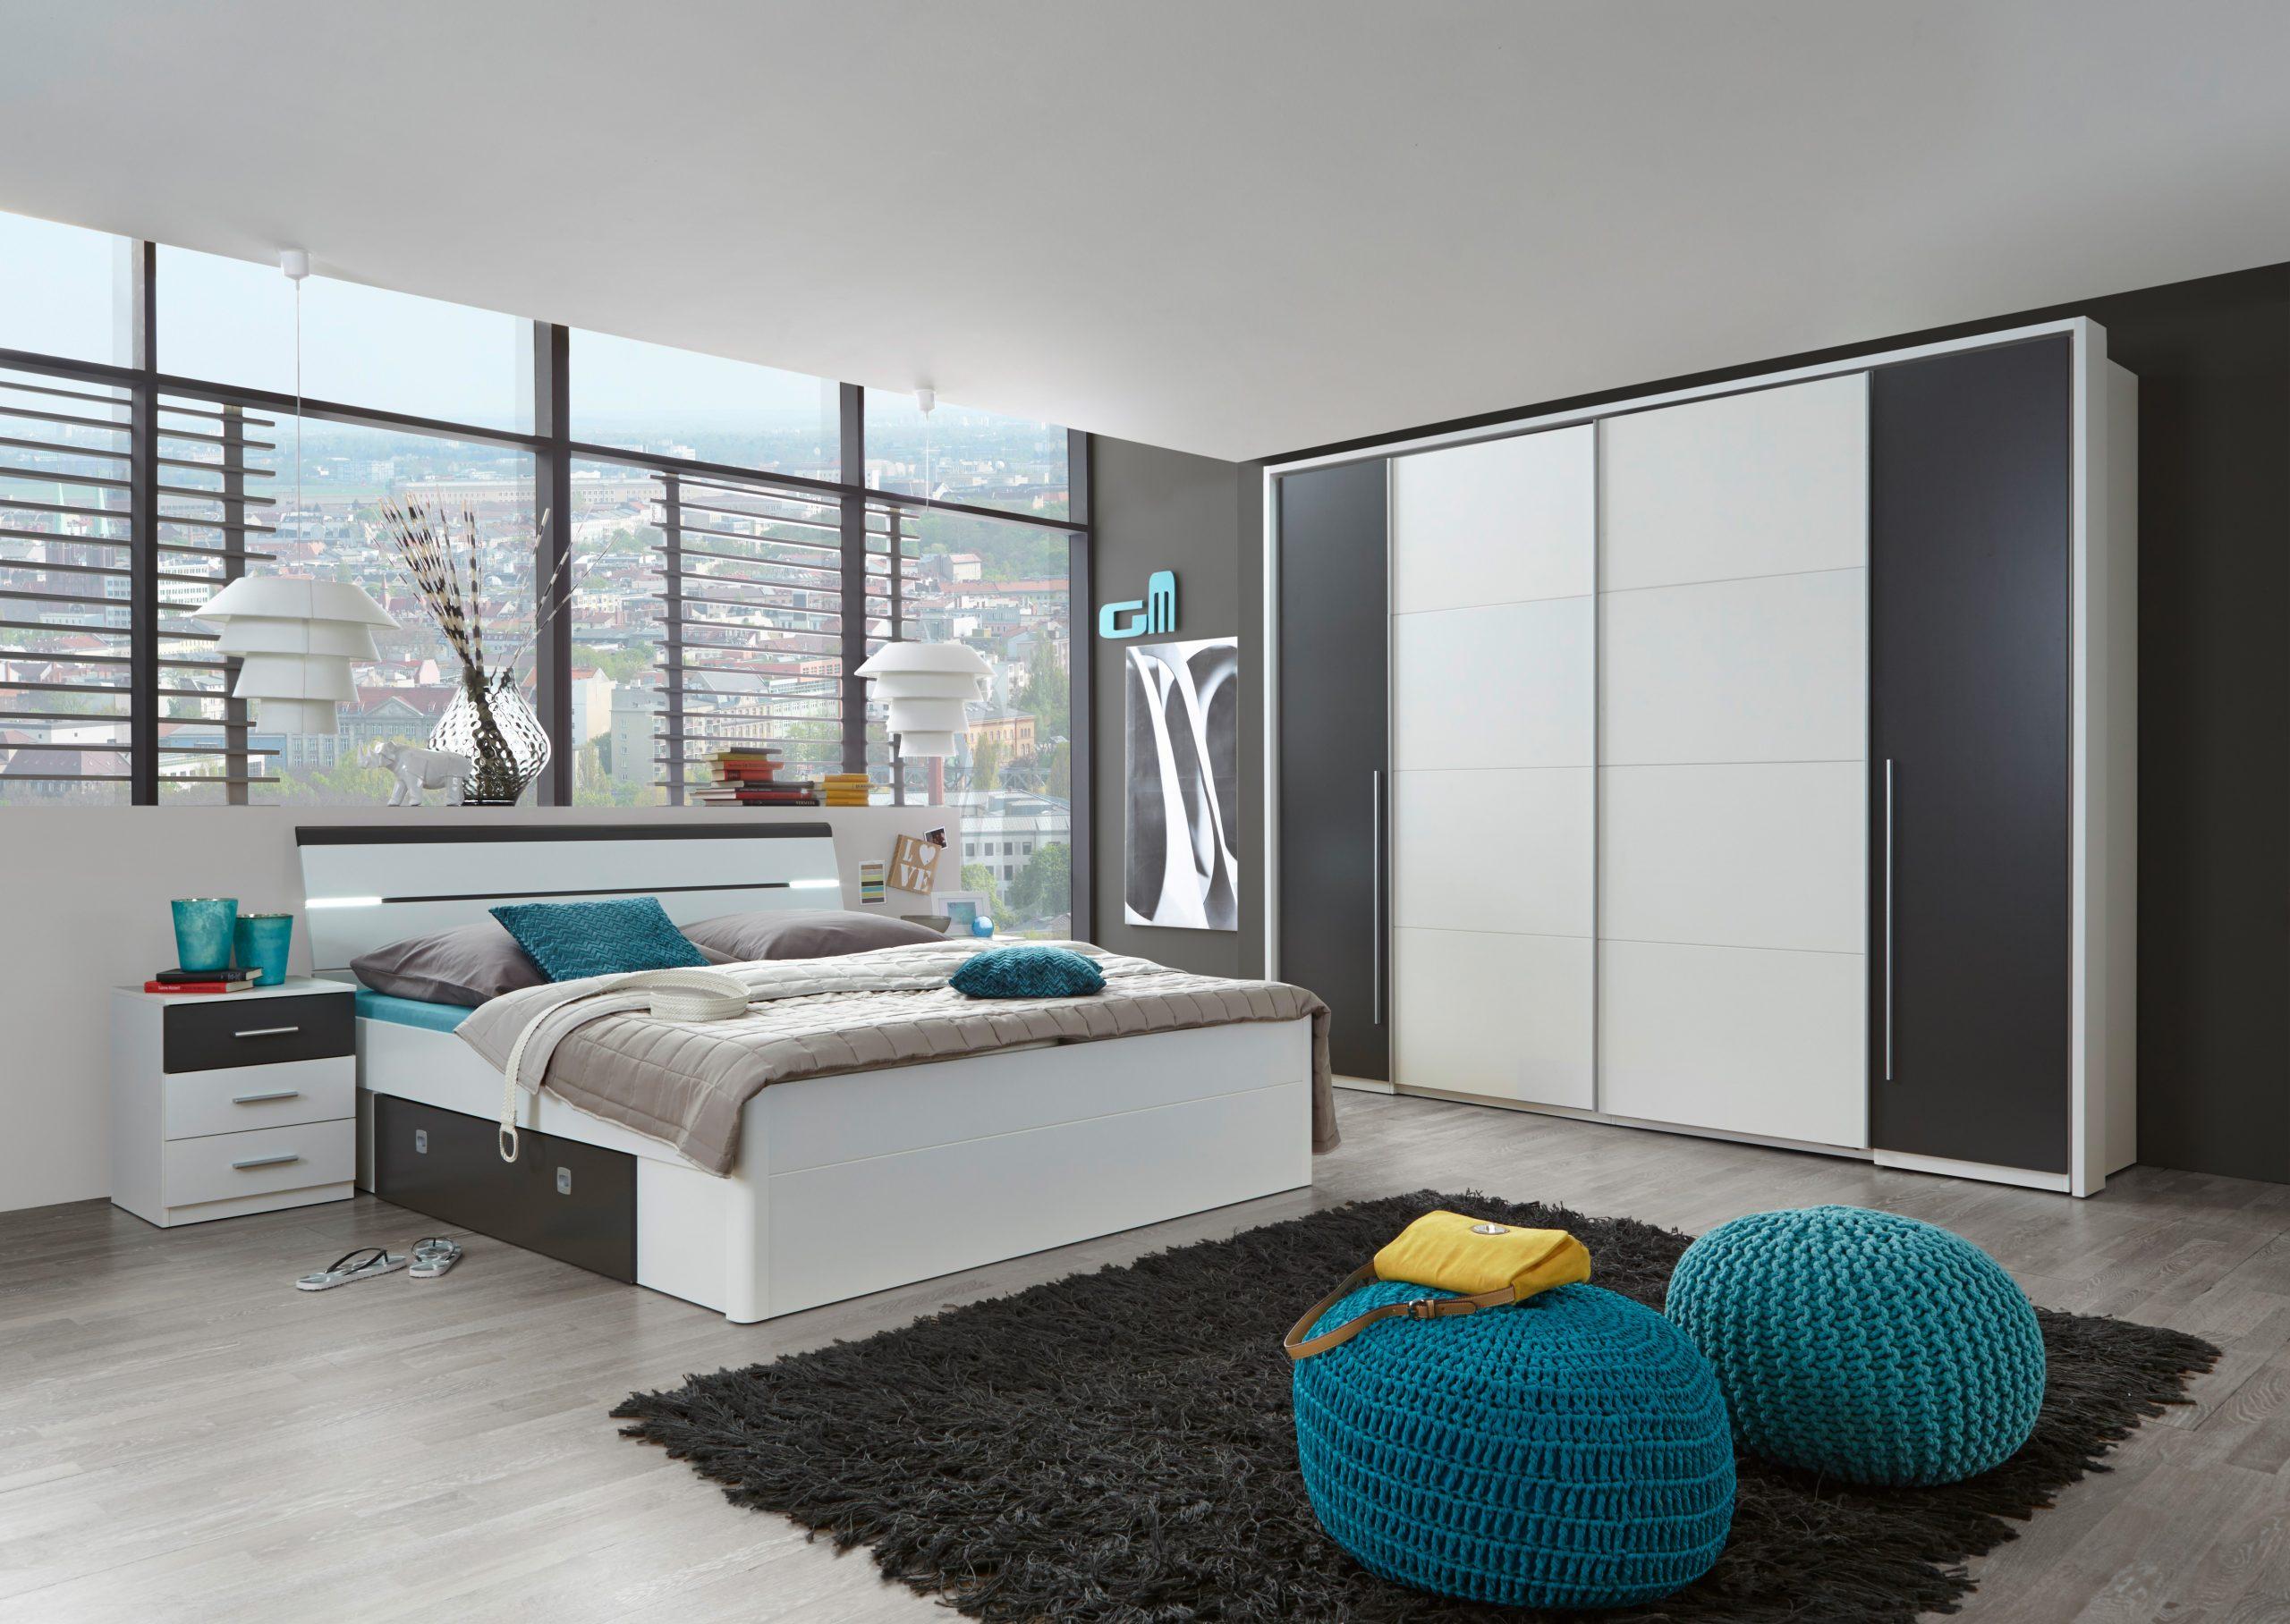 Full Size of Schrank Bett Kombination Ikea 160x200 Schrankbett 180x200 Ebay Set Kombi Bettanlage Schlafzimmer Komplett Mars Kleiderschrank Betten 120x200 Hasena Team 7 Bett Bett Schrank